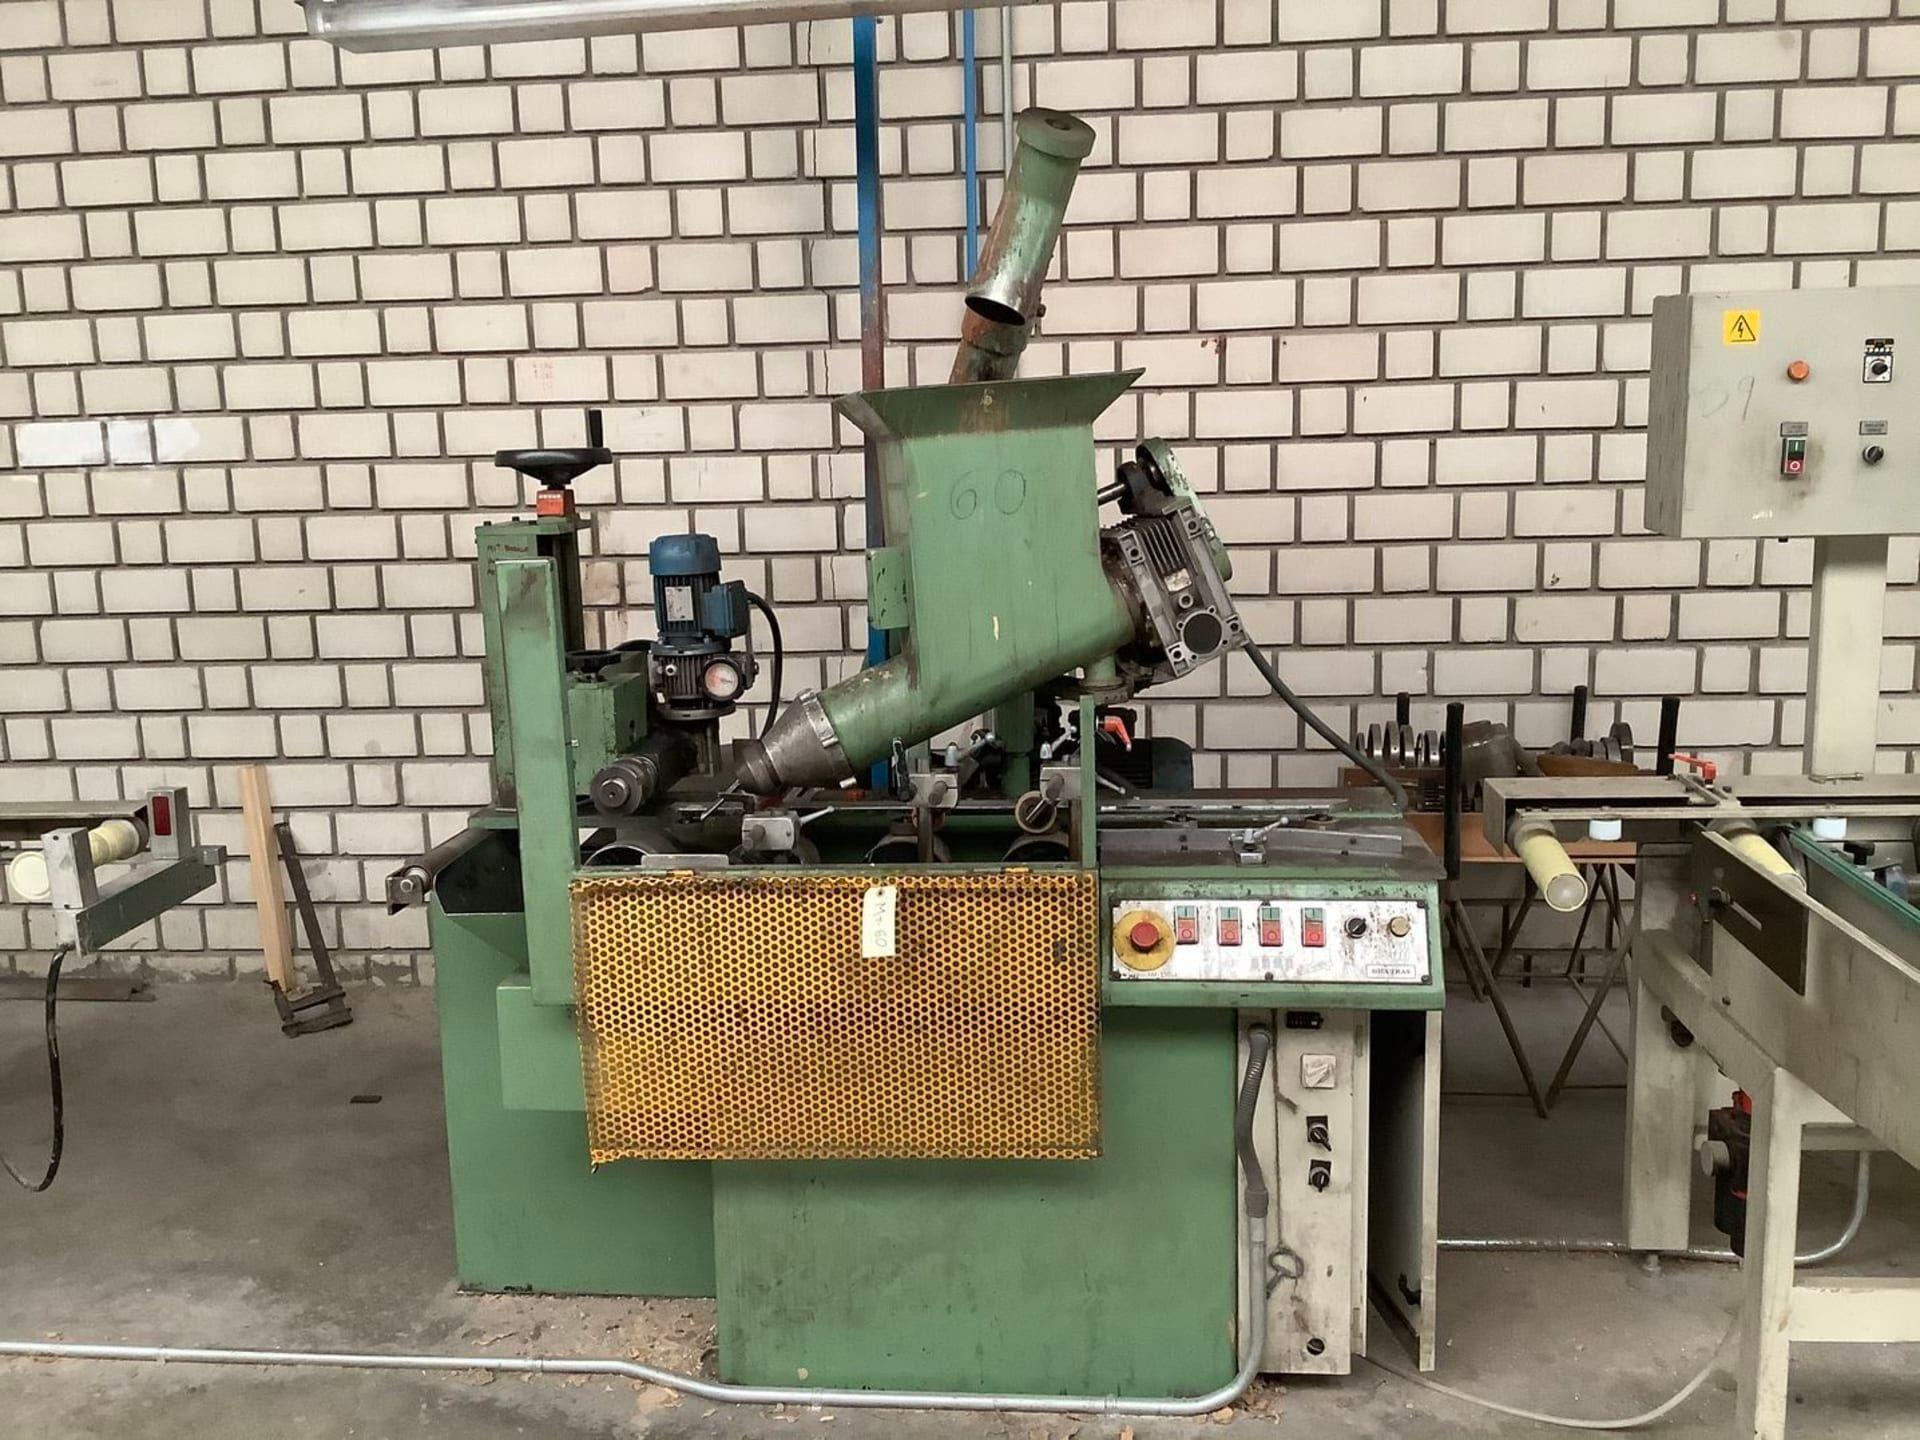 HIGUERAS AM 130 4 Zellstoff-Prägemaschine